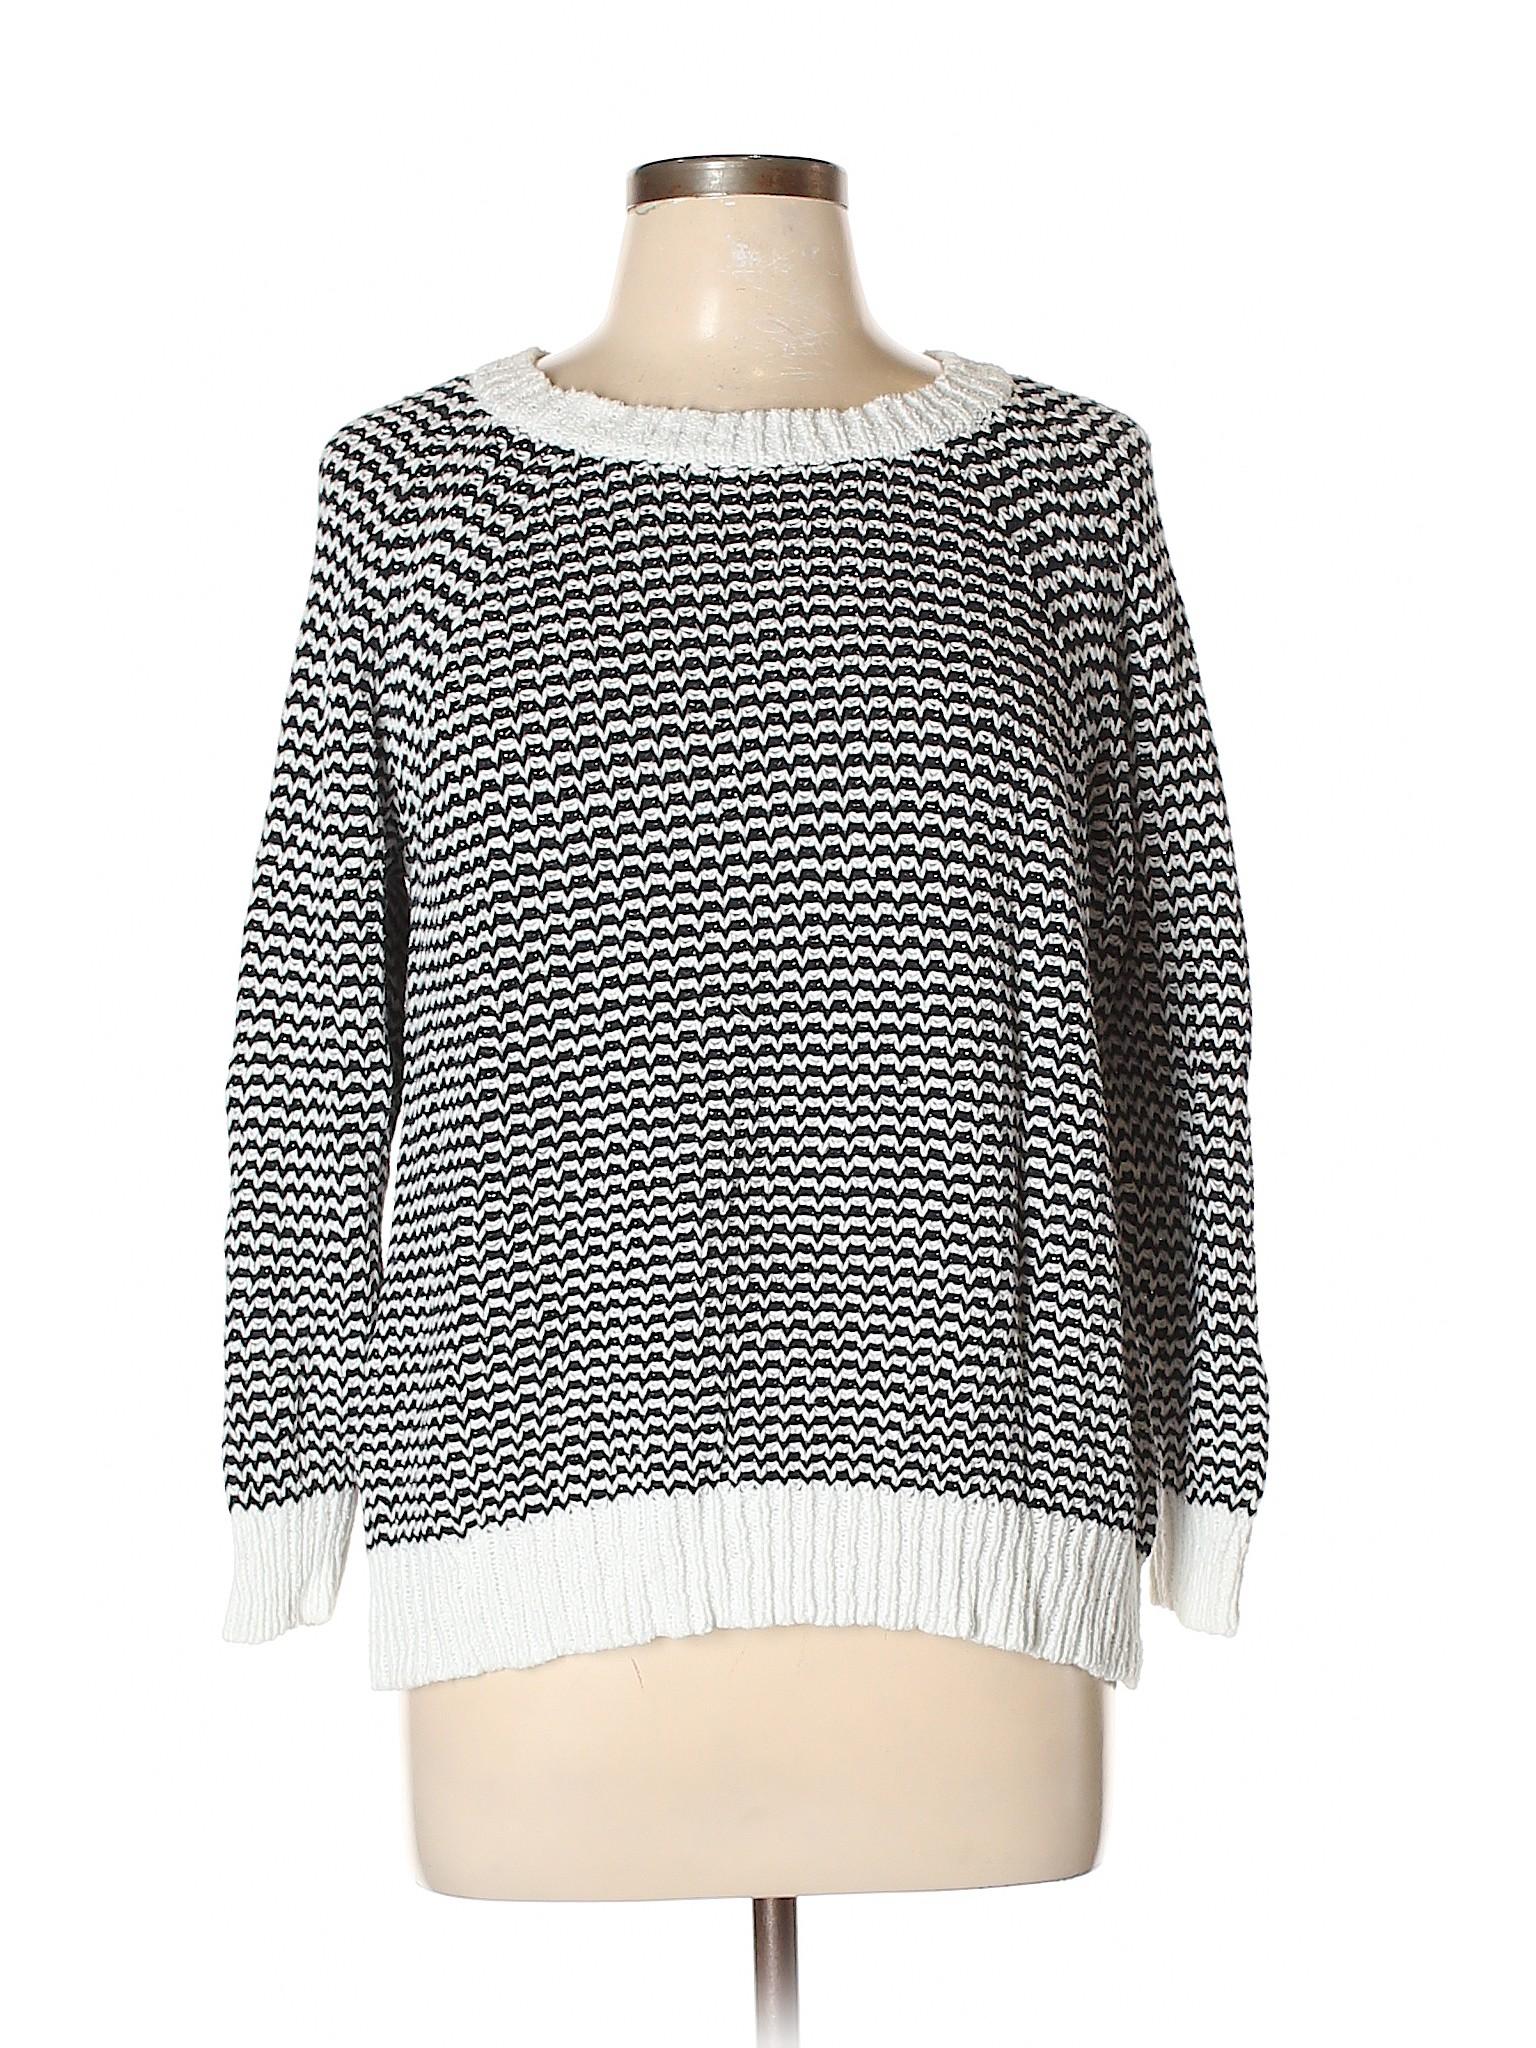 Boutique J Pullover Boutique J Crew Sweater Crew Pullover Sweater Boutique fngwPqFO